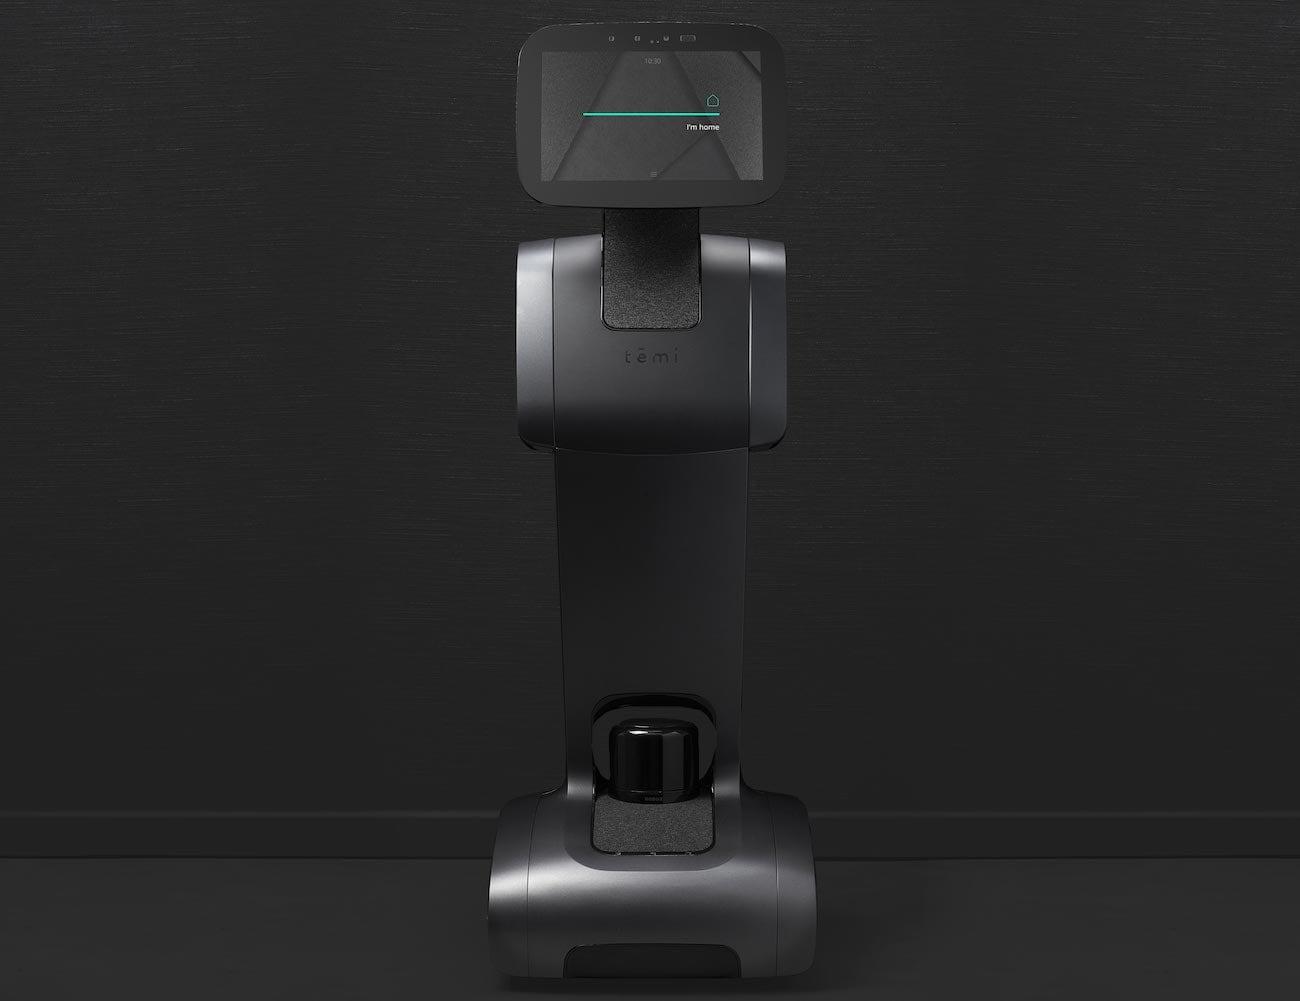 Temi Smart Personal Home Robot